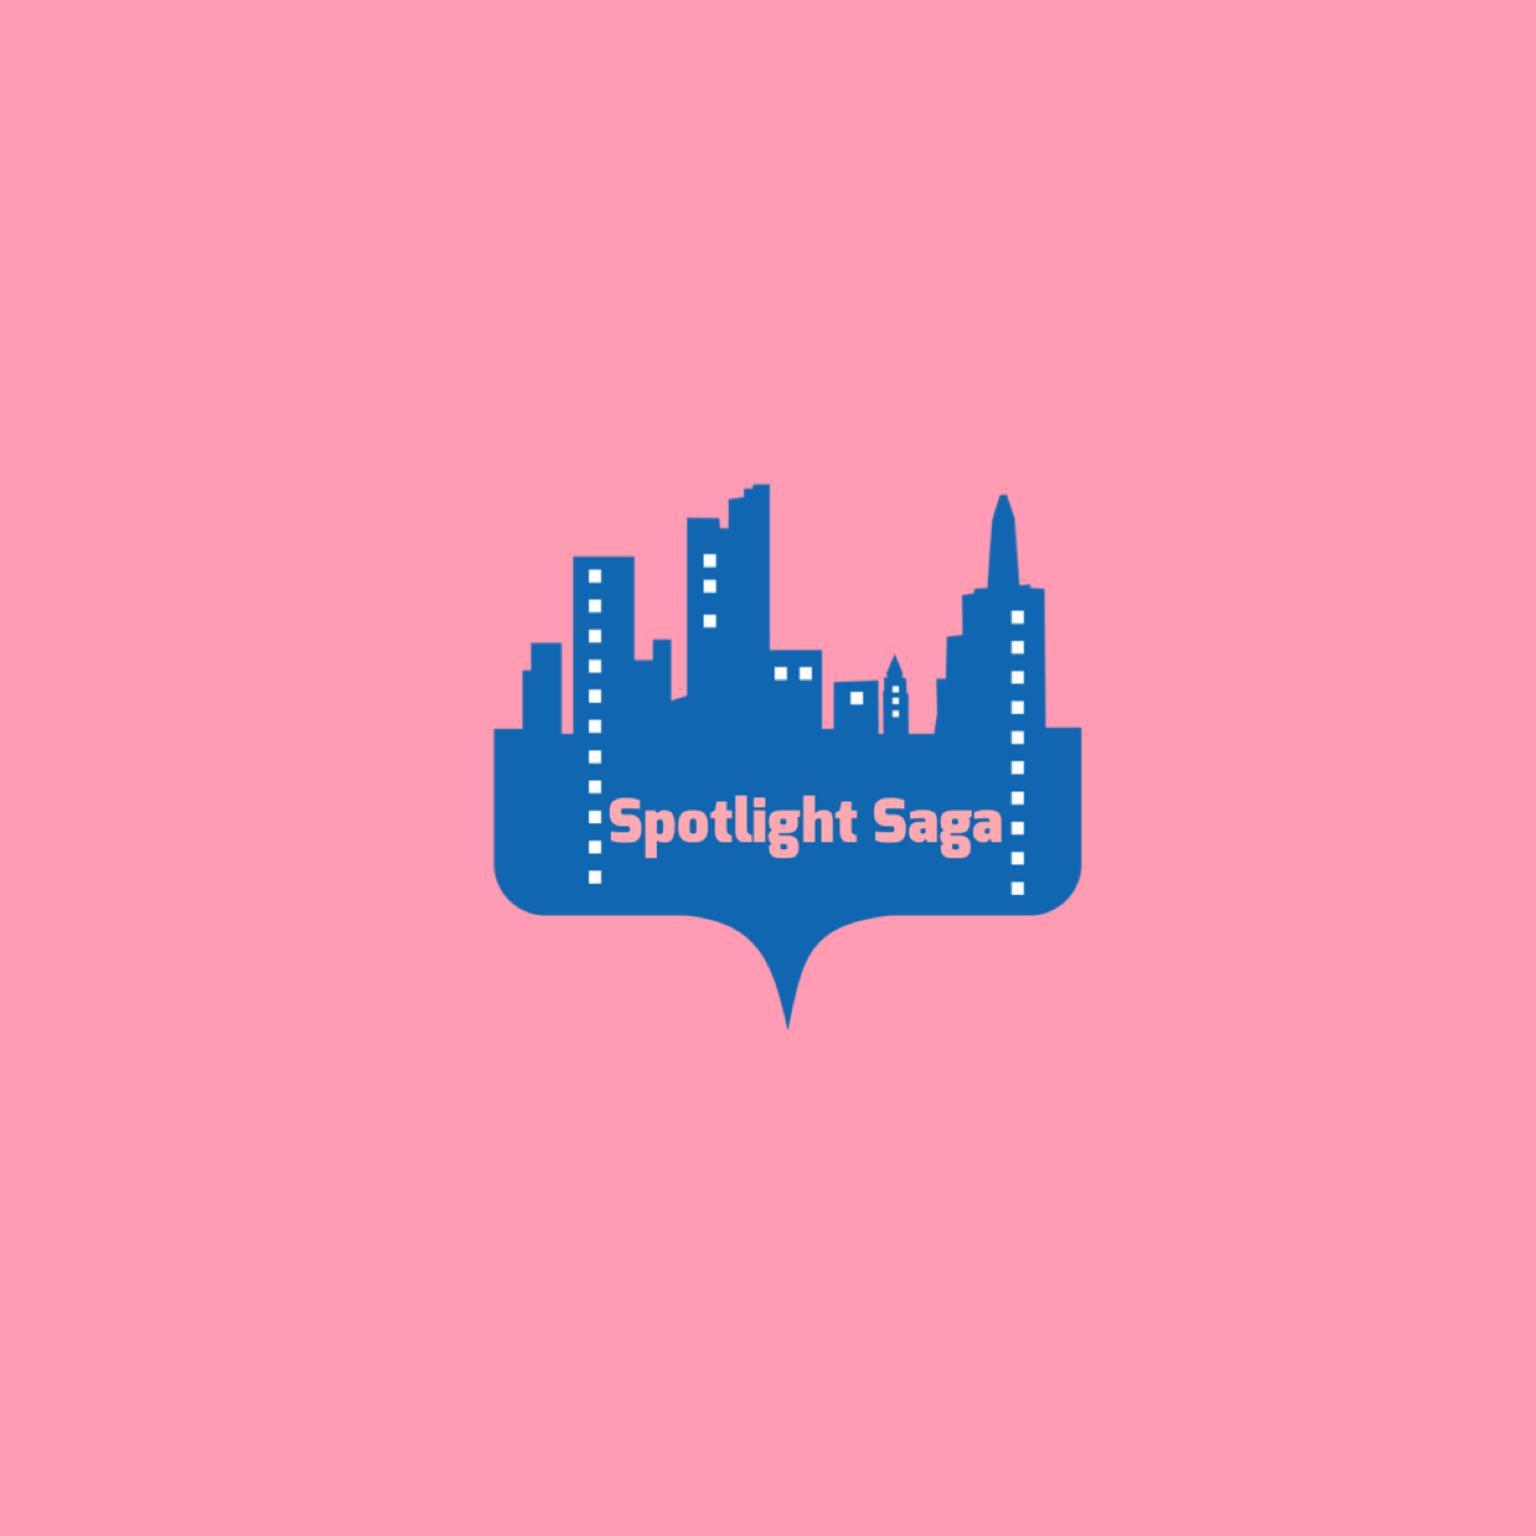 Spotlight Saga